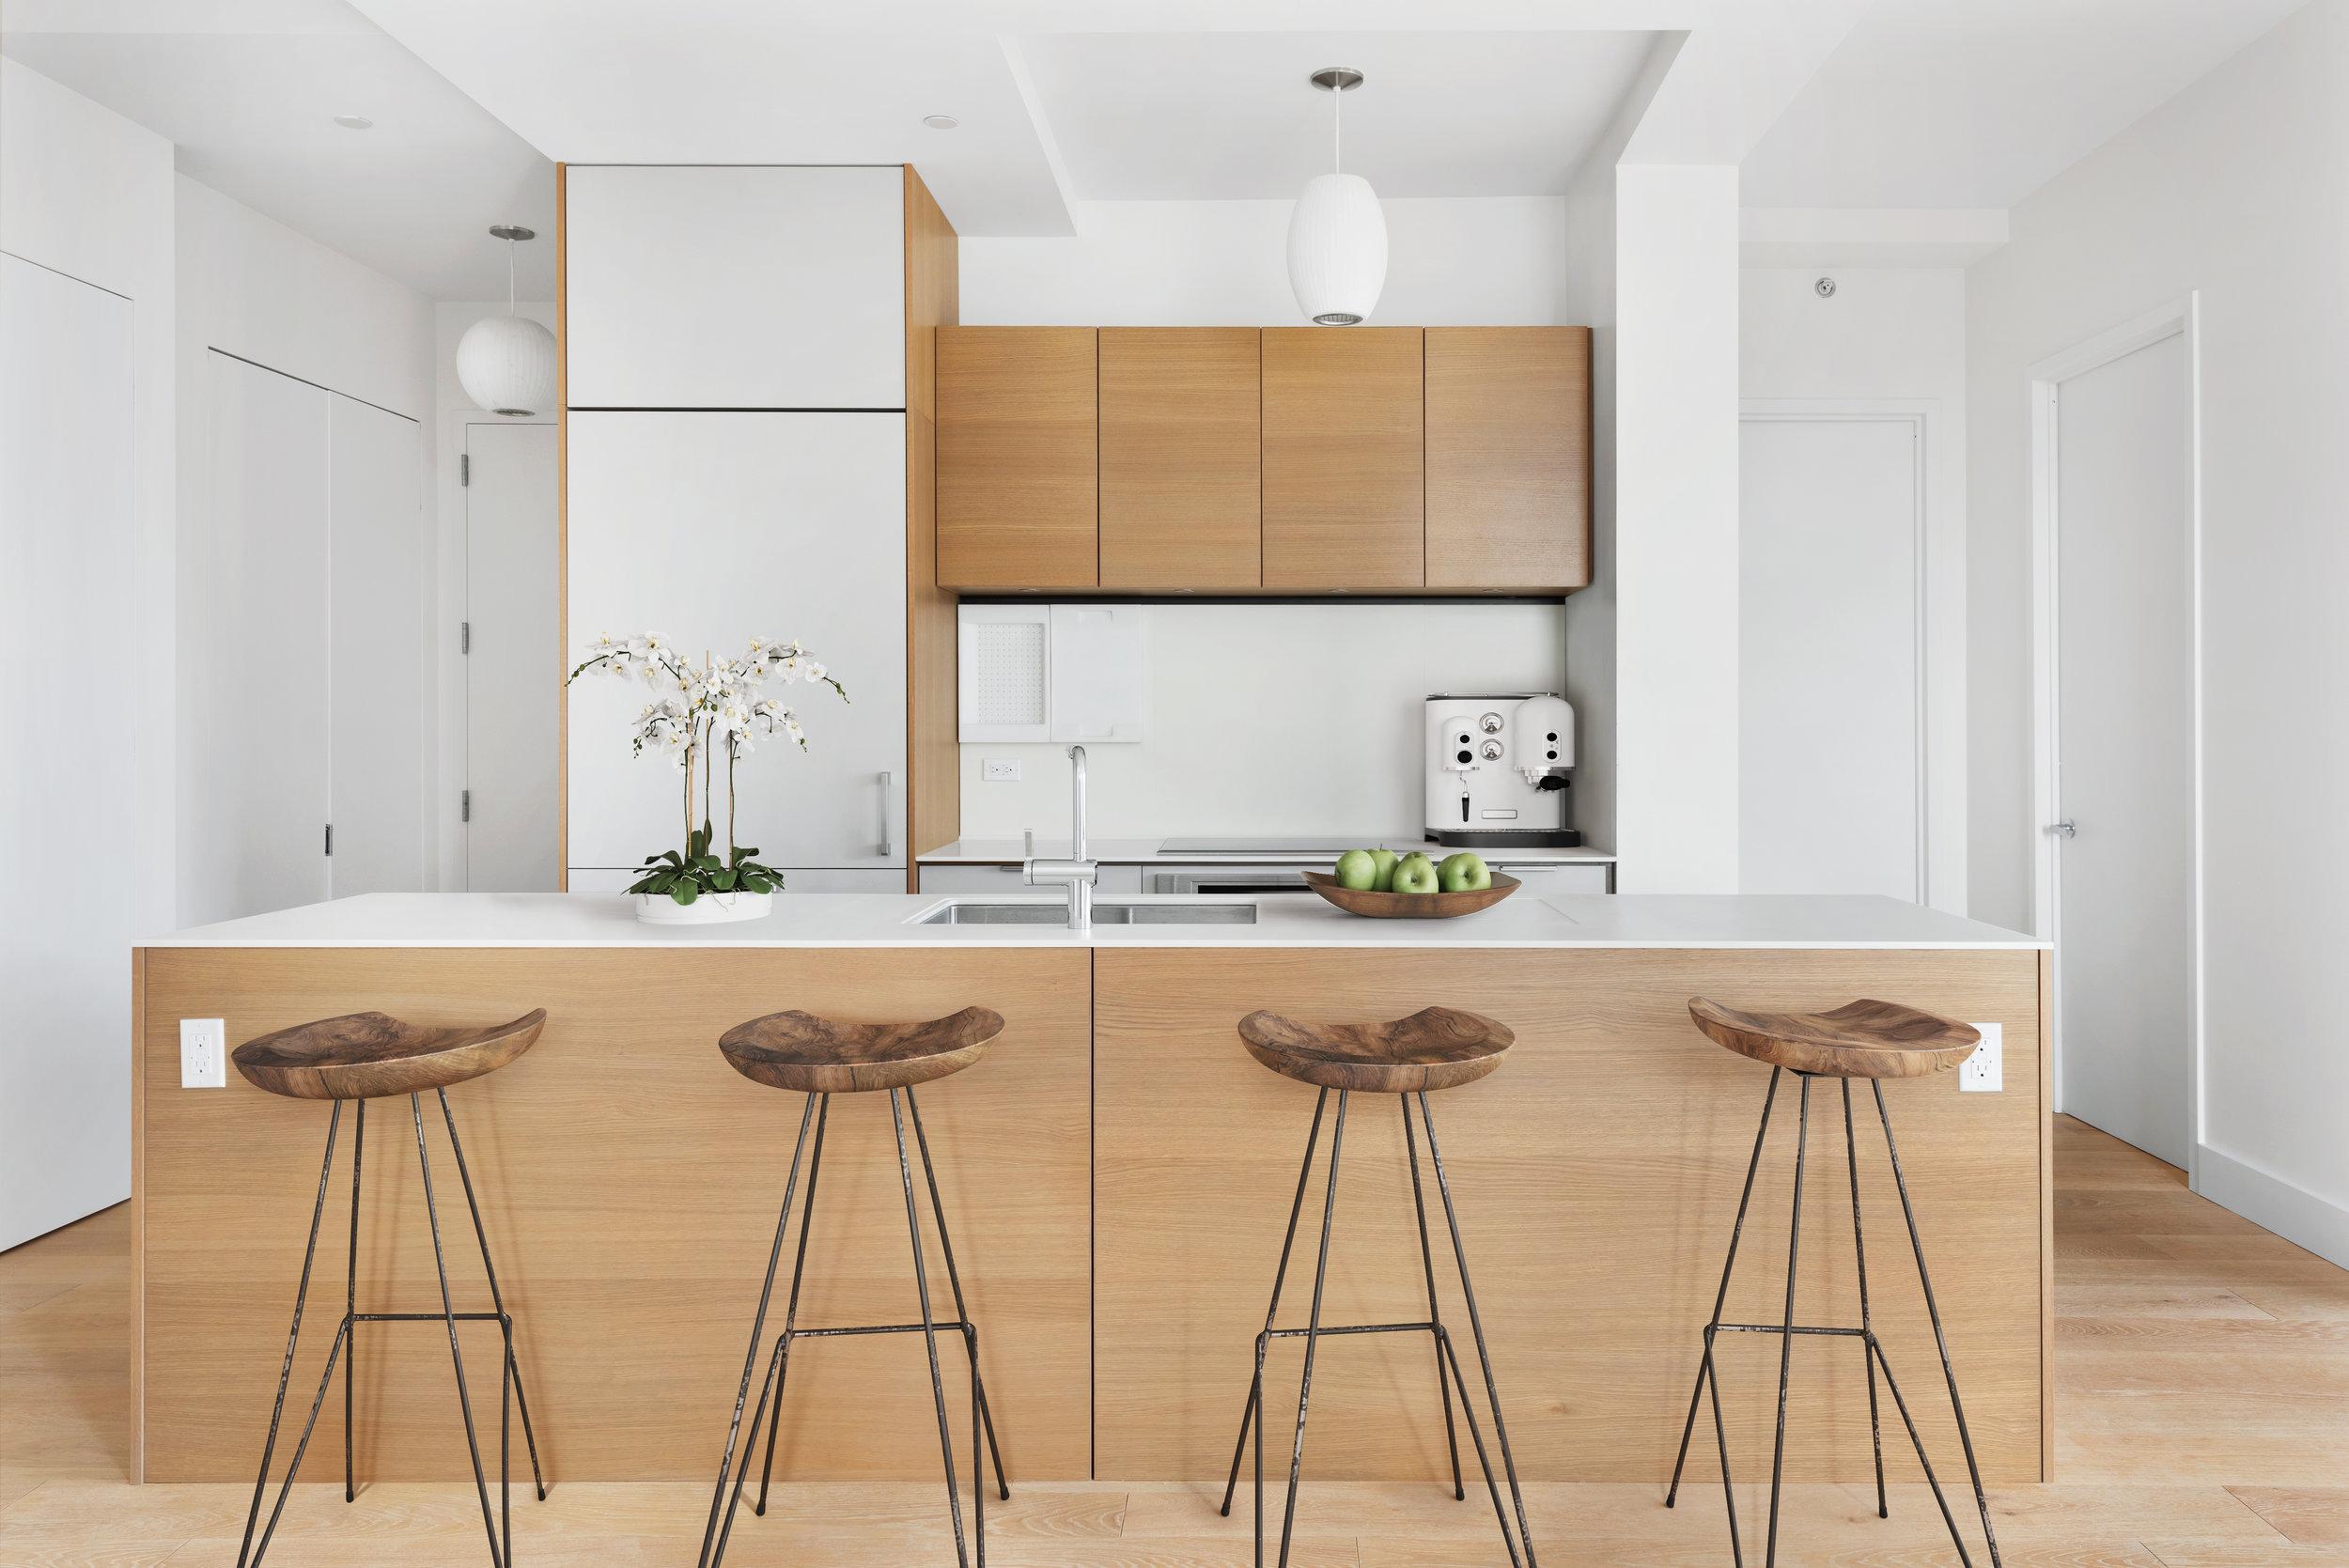 Bolster Smart Renovation Henrybuilt Kitchen front.jpg